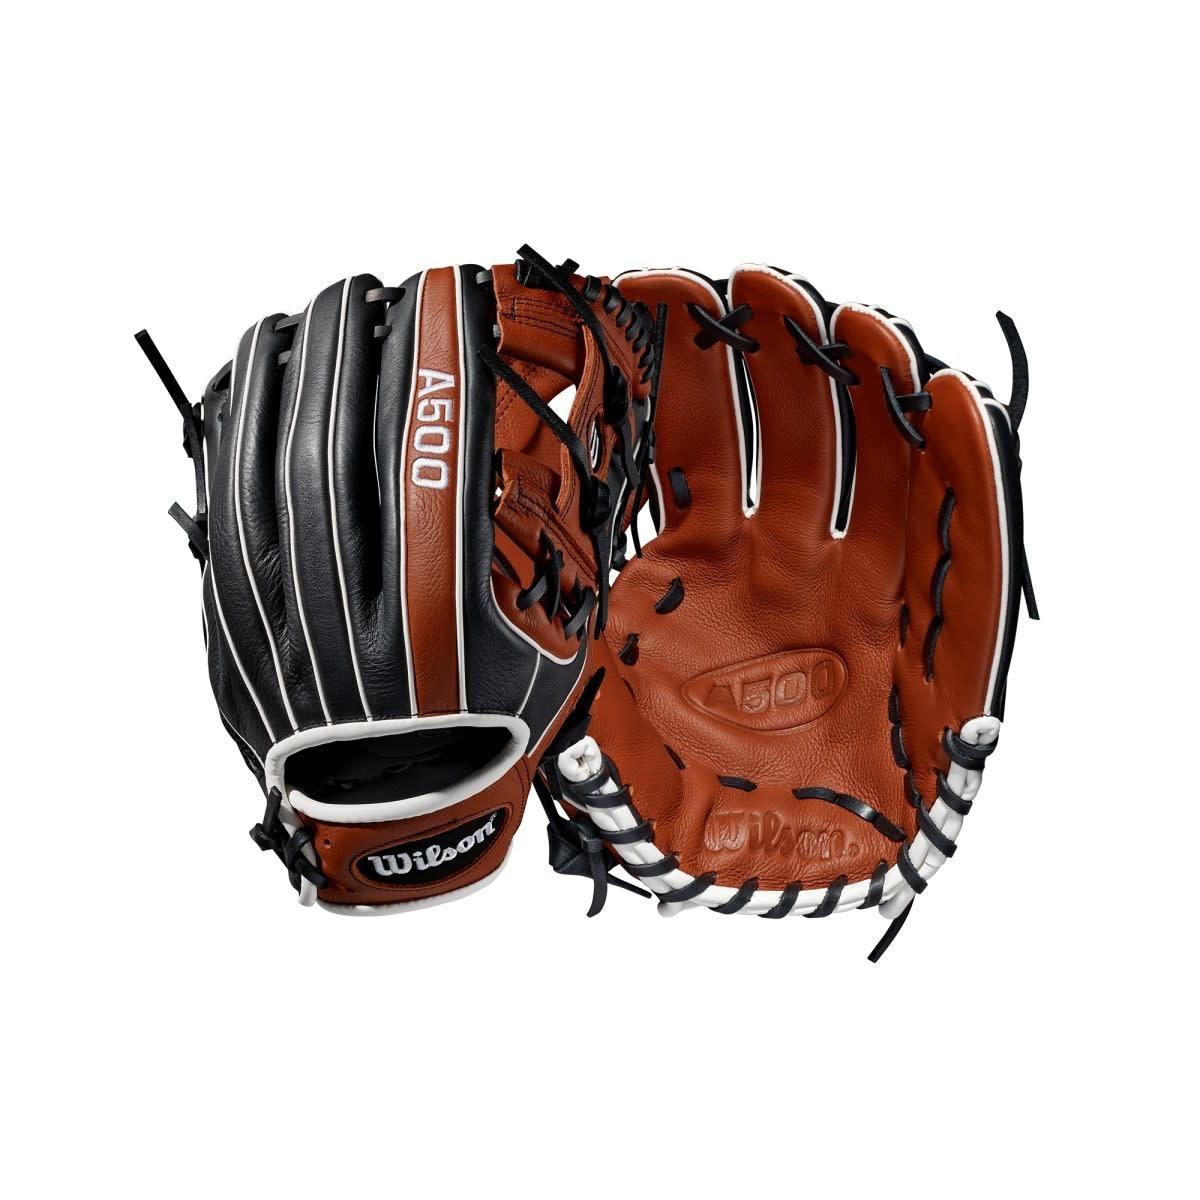 "Wilson A500 Baseball Glove - Cooper/Black - 11.5"""